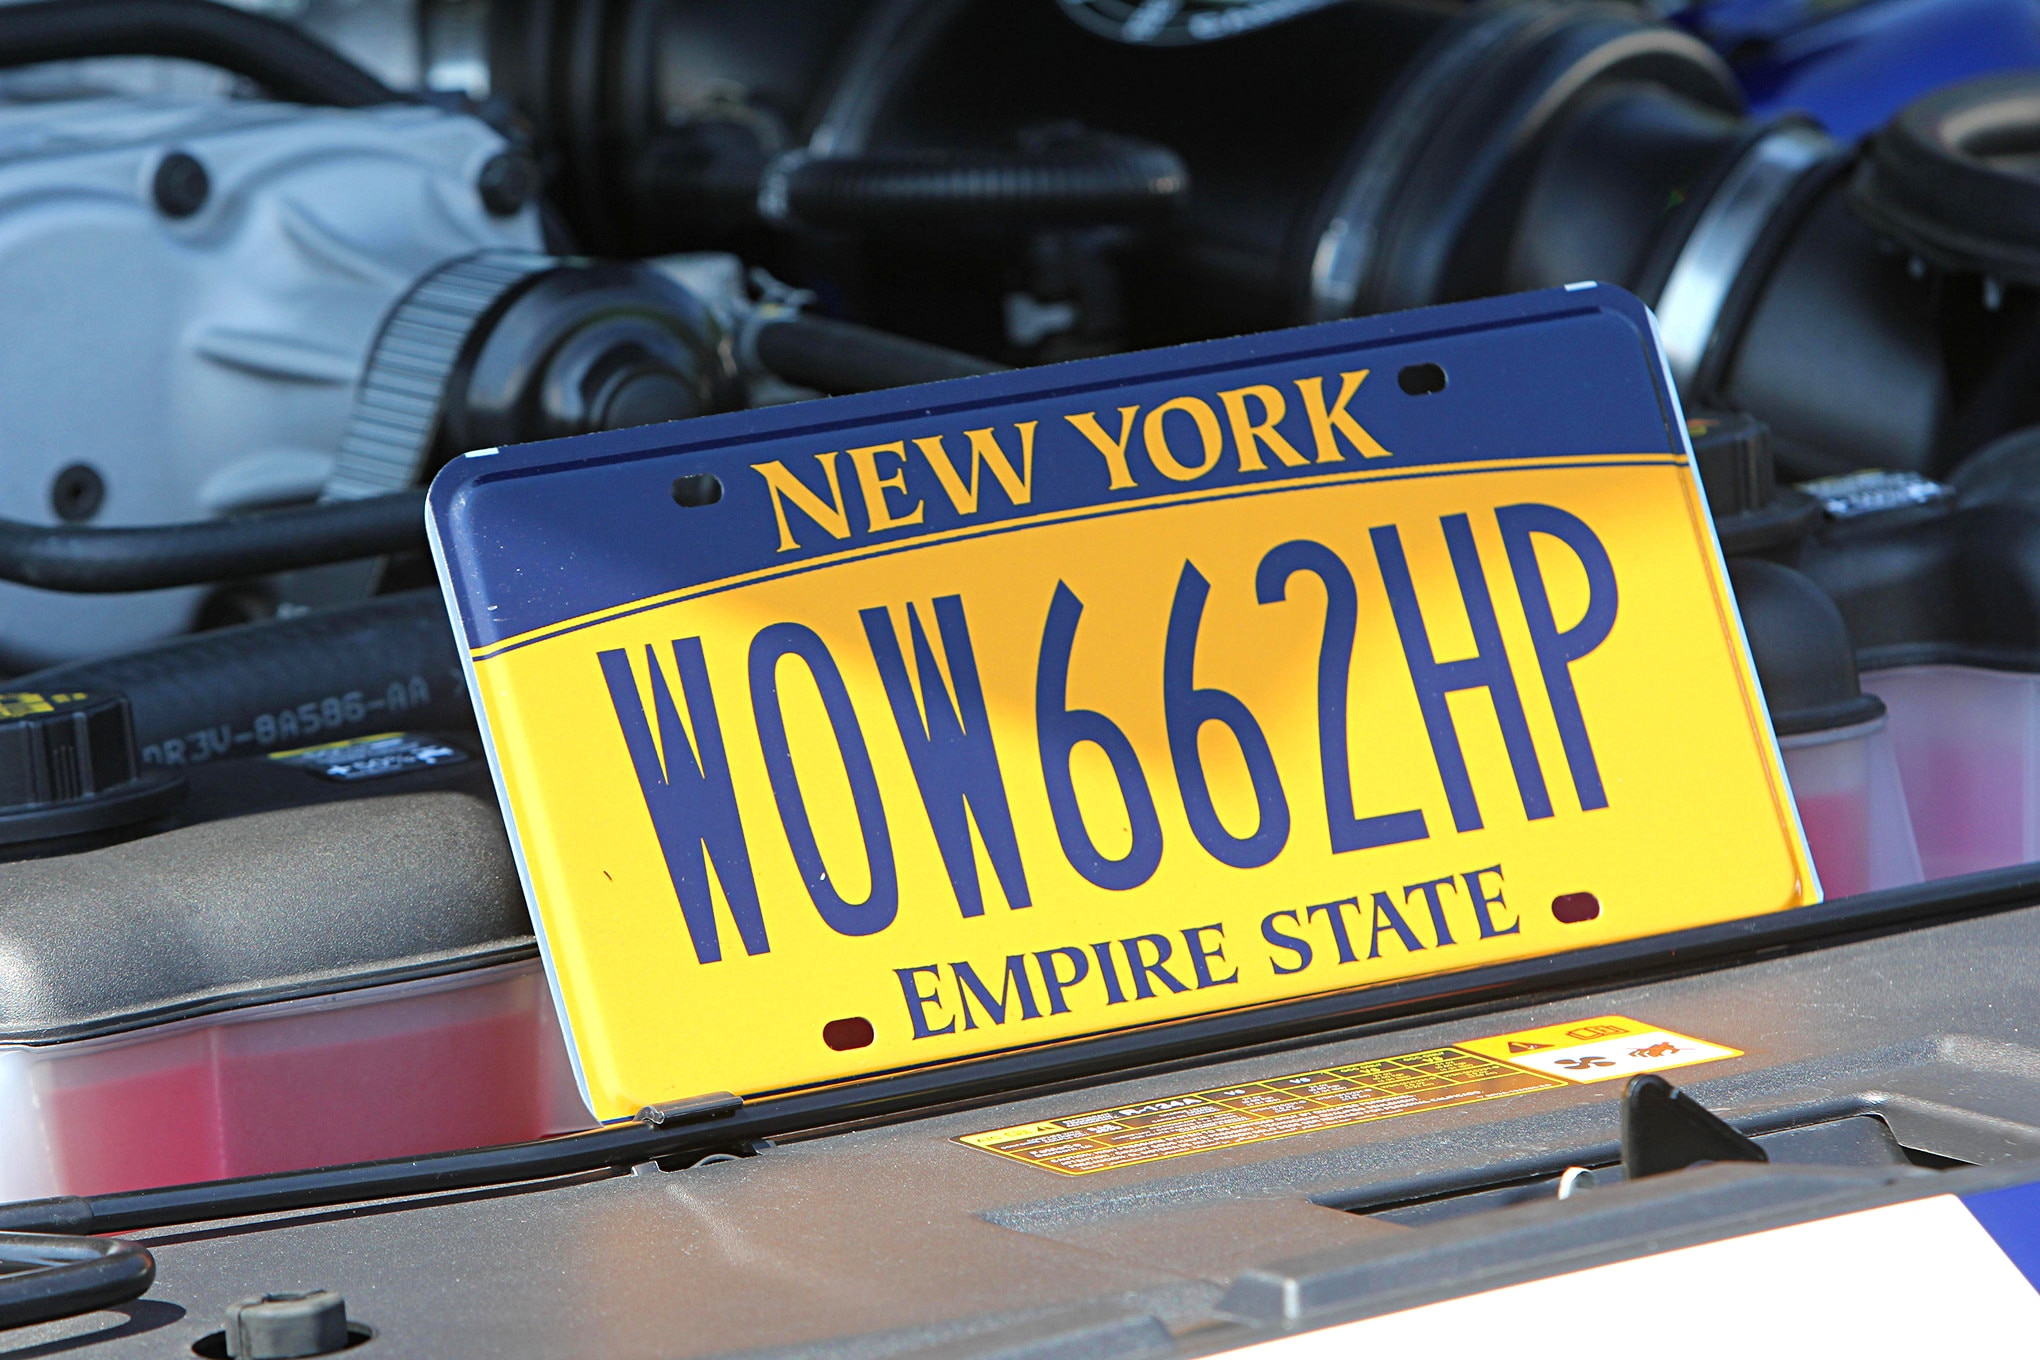 Mustang License Plates 058